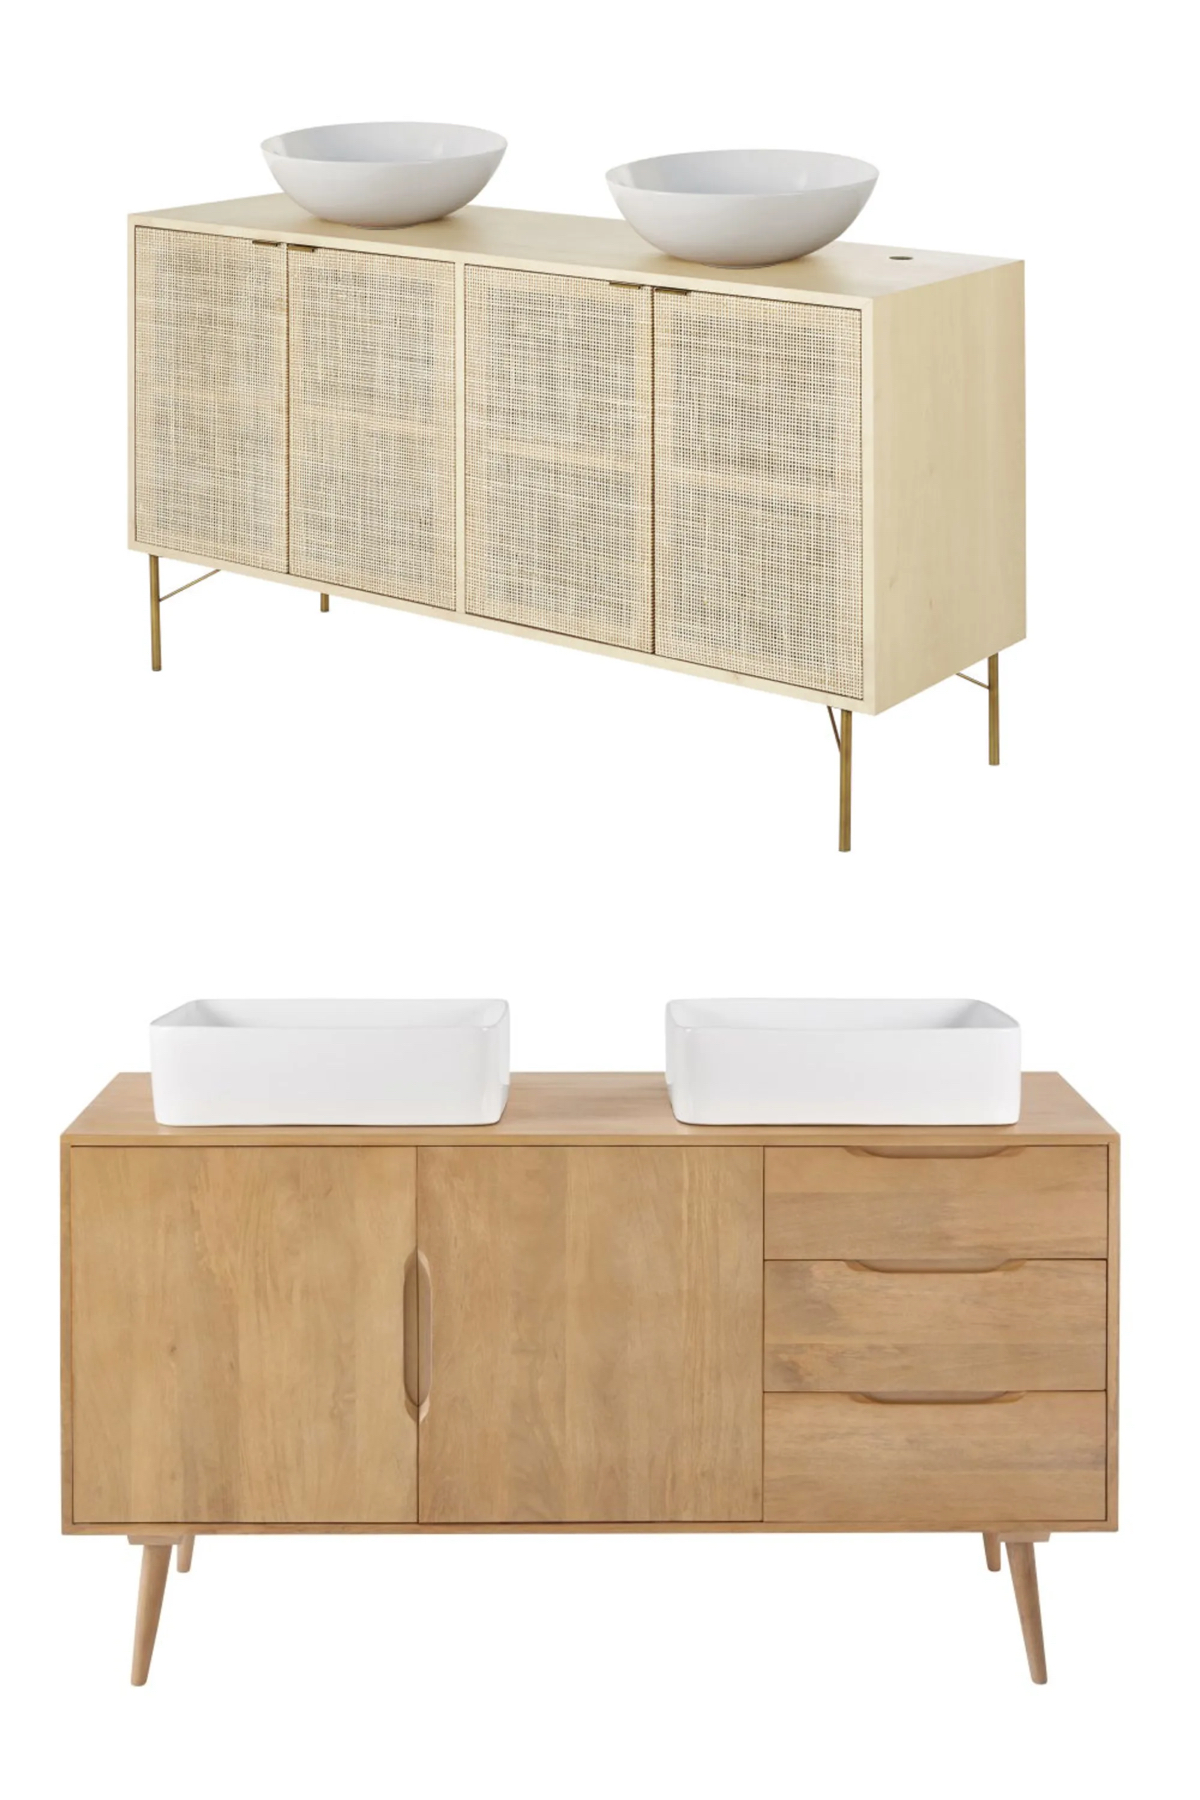 meuble double vasque ronde cannage rotin bois manguier